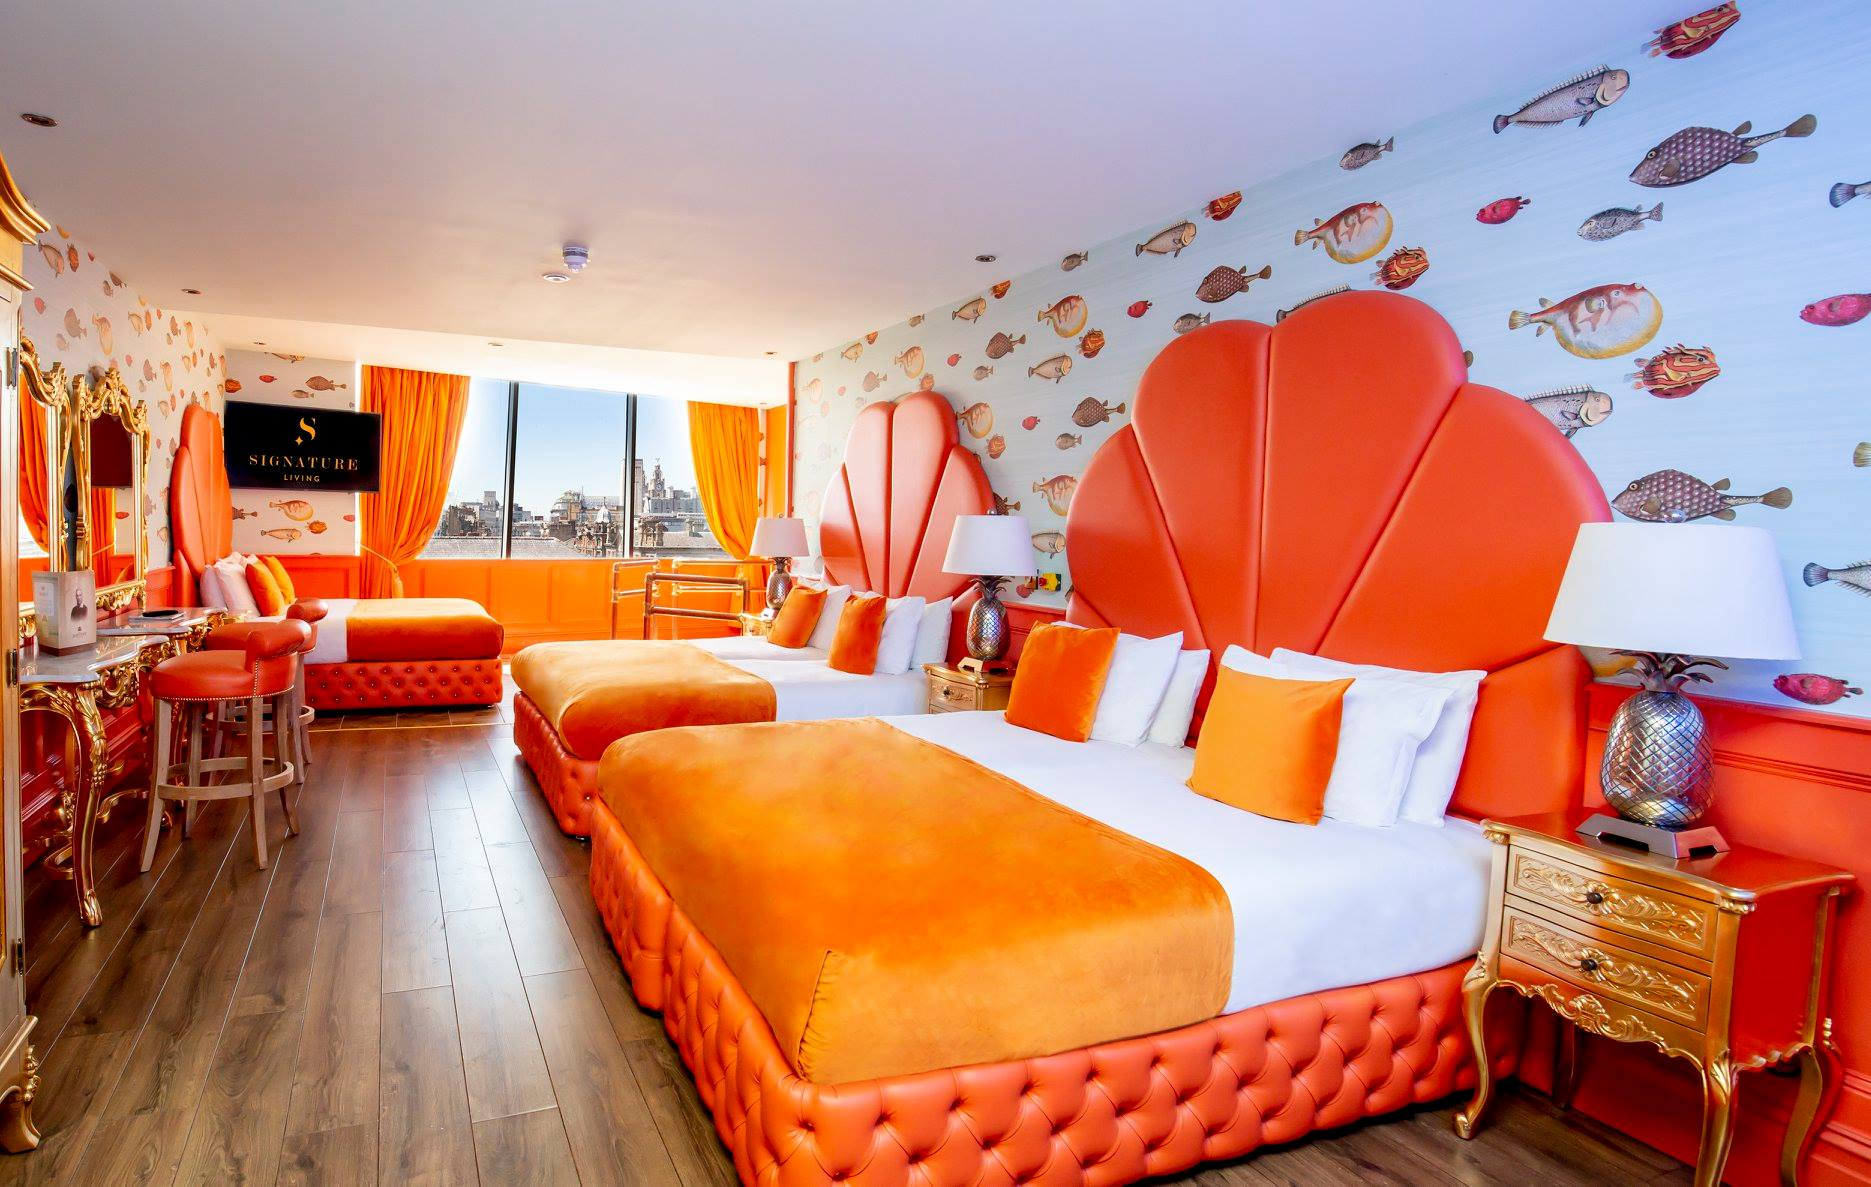 OMG instragram-worthy hotel